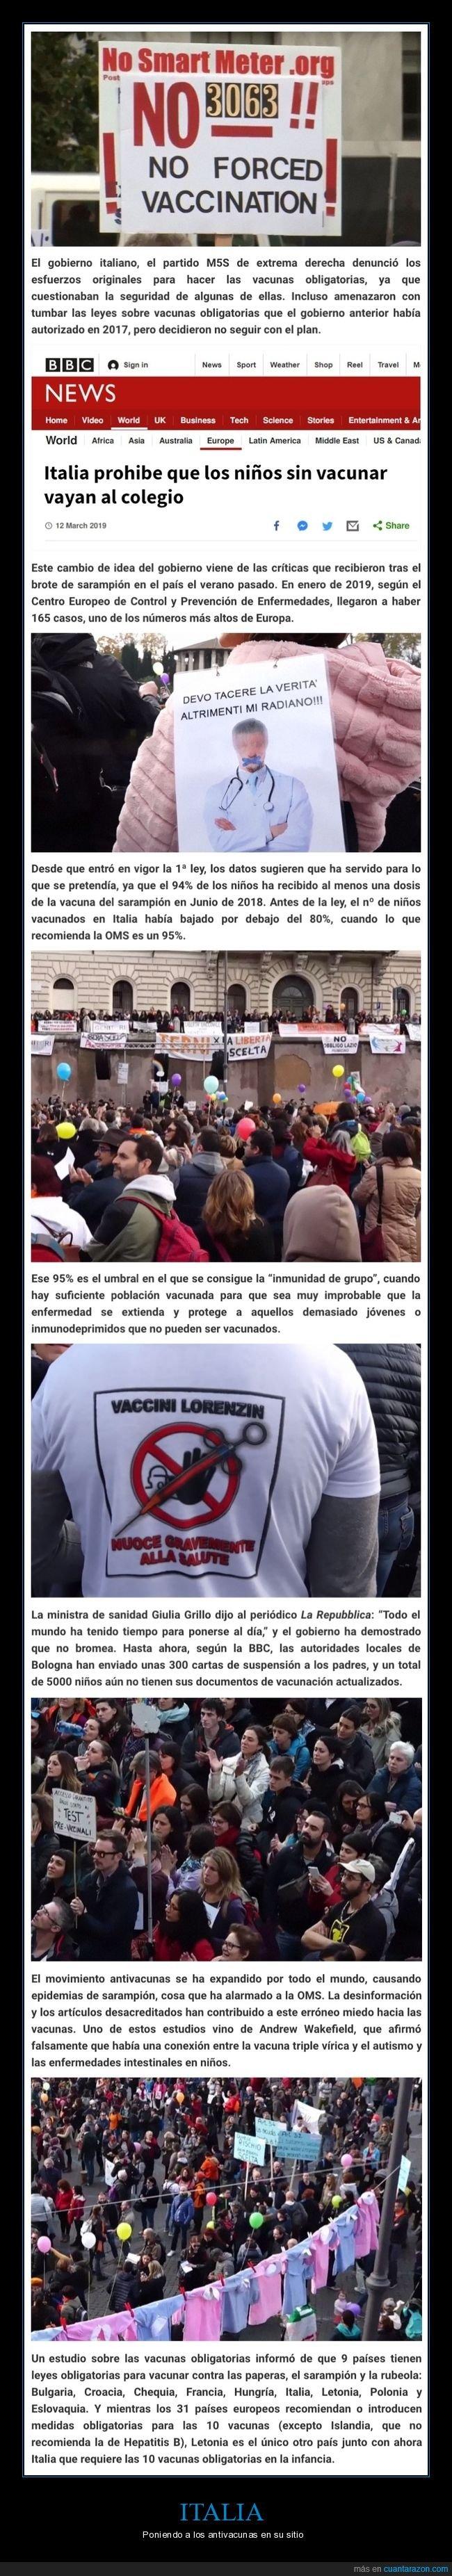 antivacunas,italia,vacunas